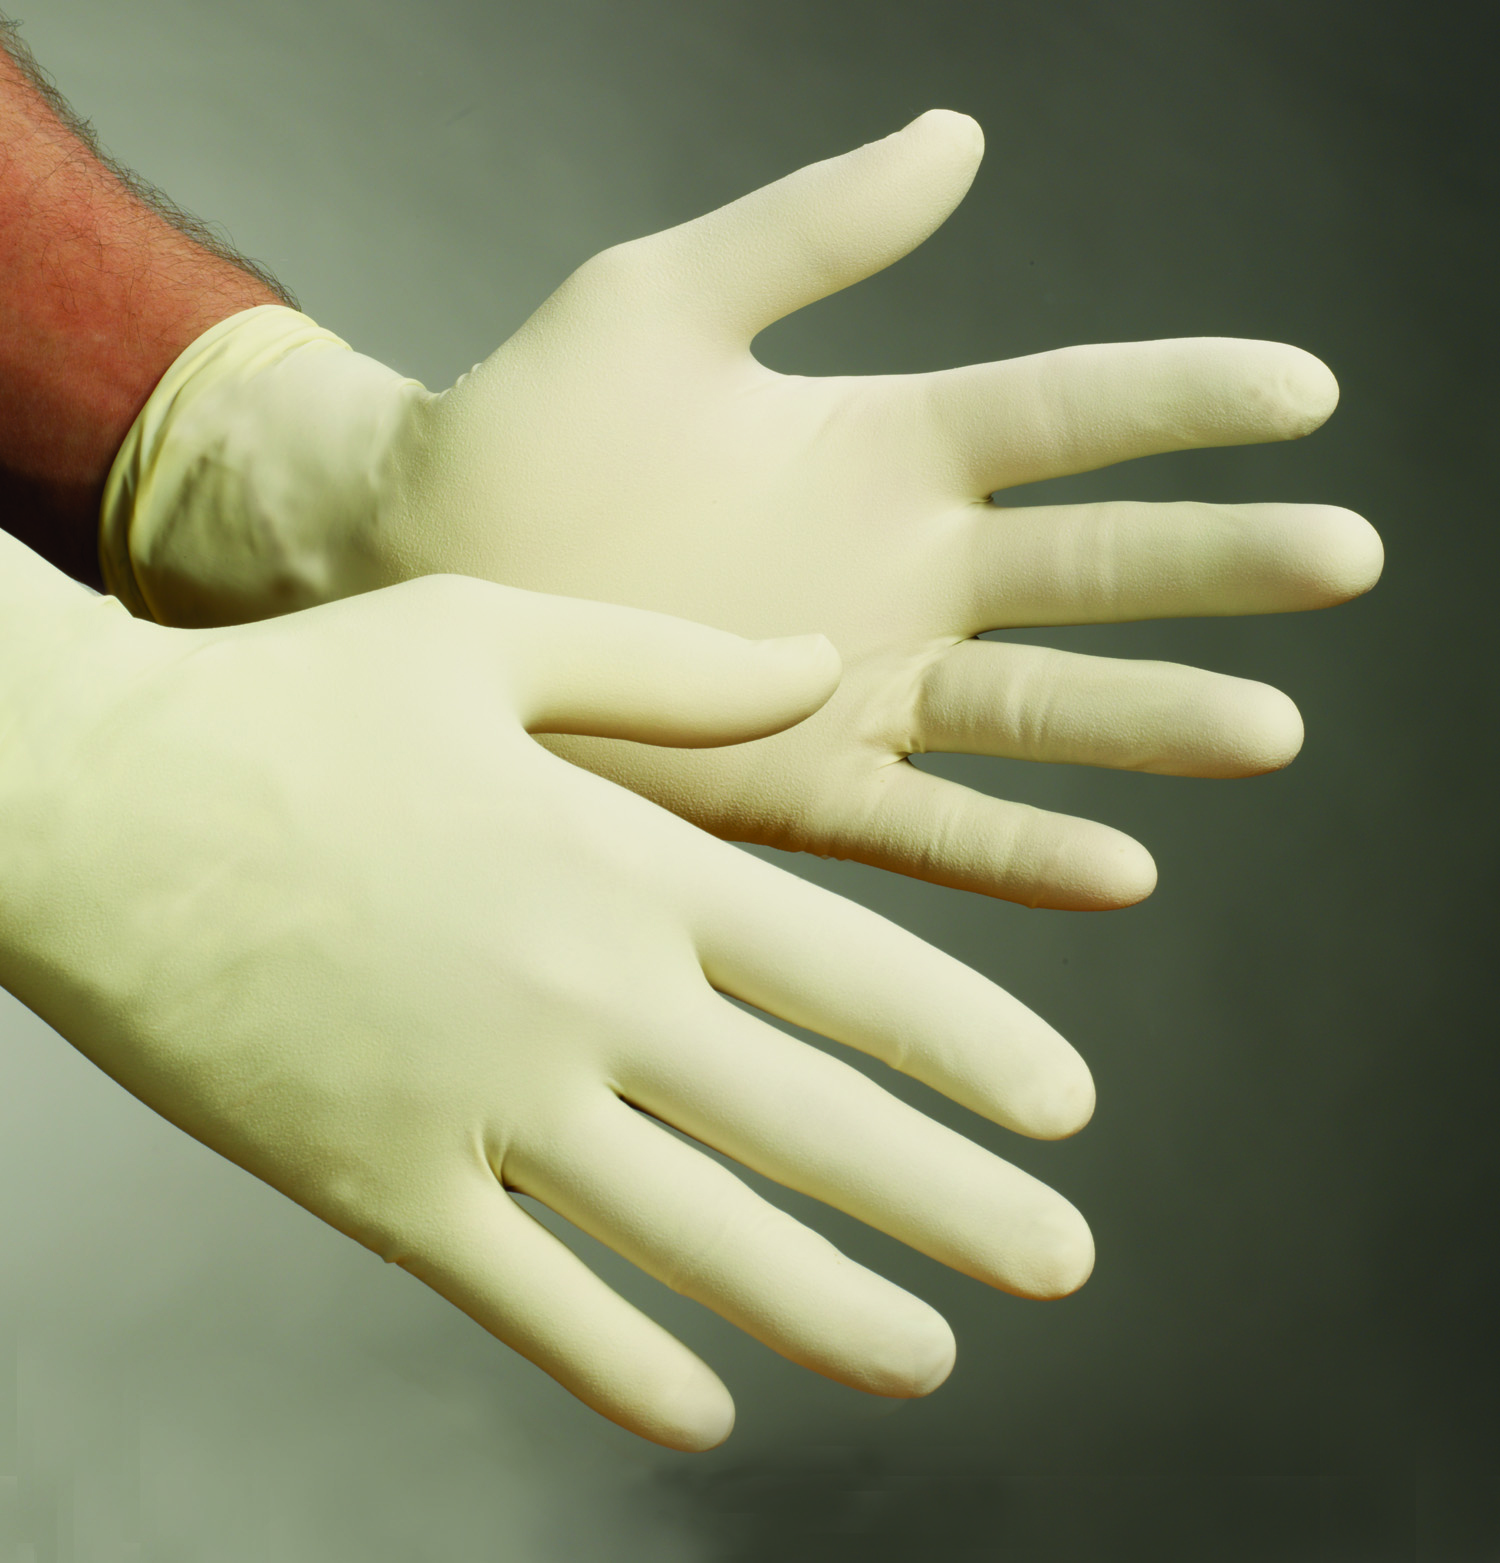 Microflex Powder-Free E-Grip Max Disposable Latex Exam Gloves 1000Case - Large